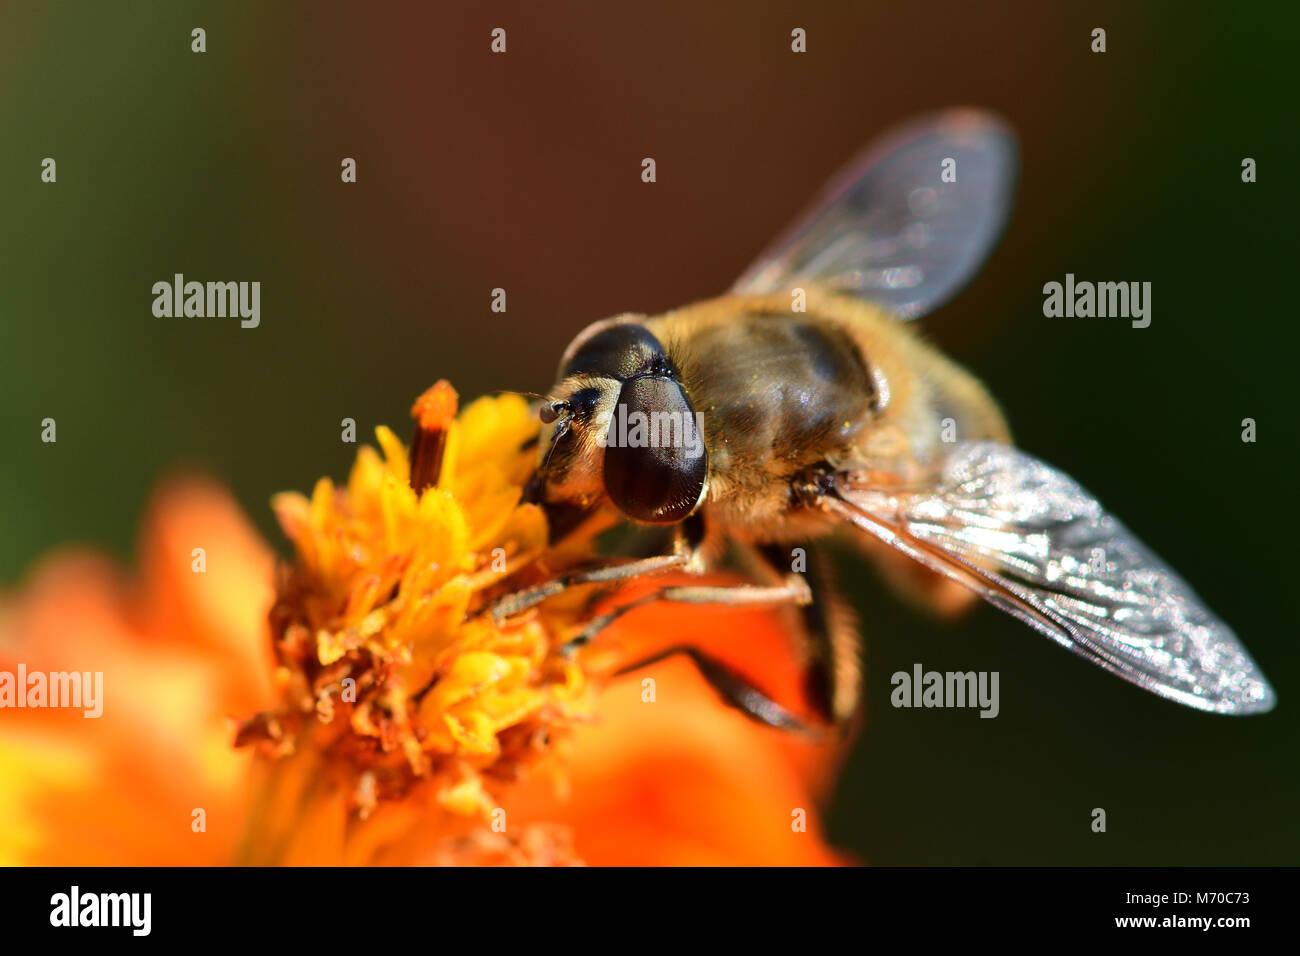 Macro shot of a bee pollinating an orange coreopsis flower - Stock Image